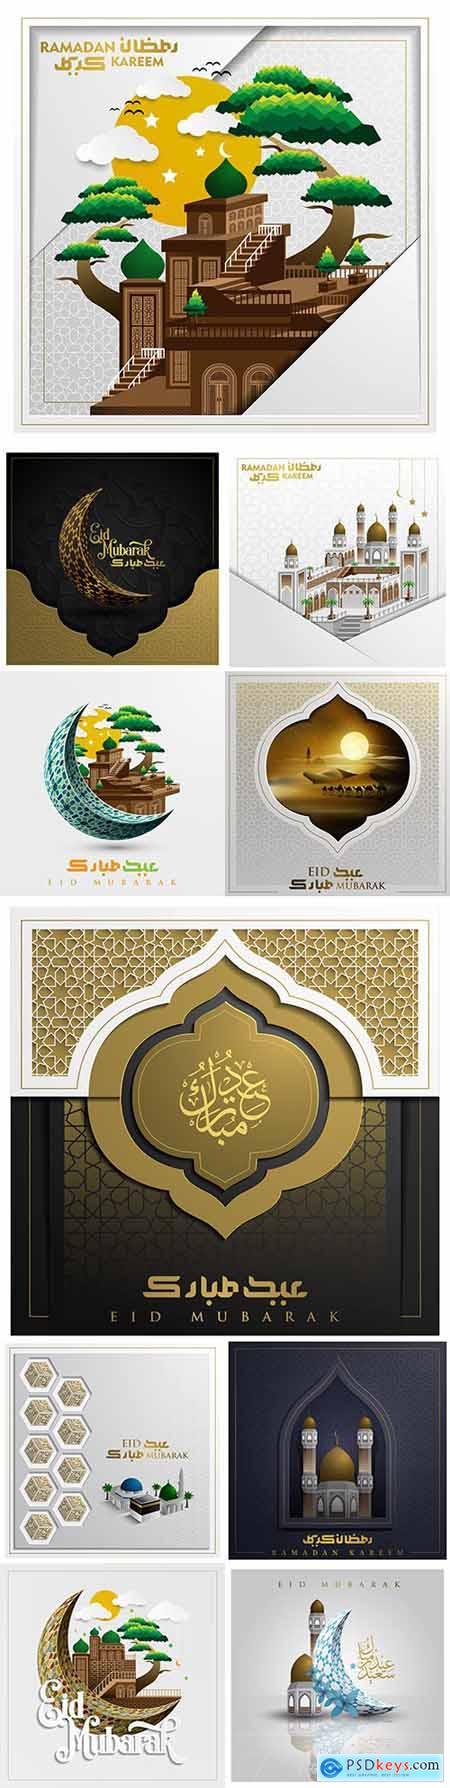 Ramadan Kareem and Eid Mubarak design greeting card